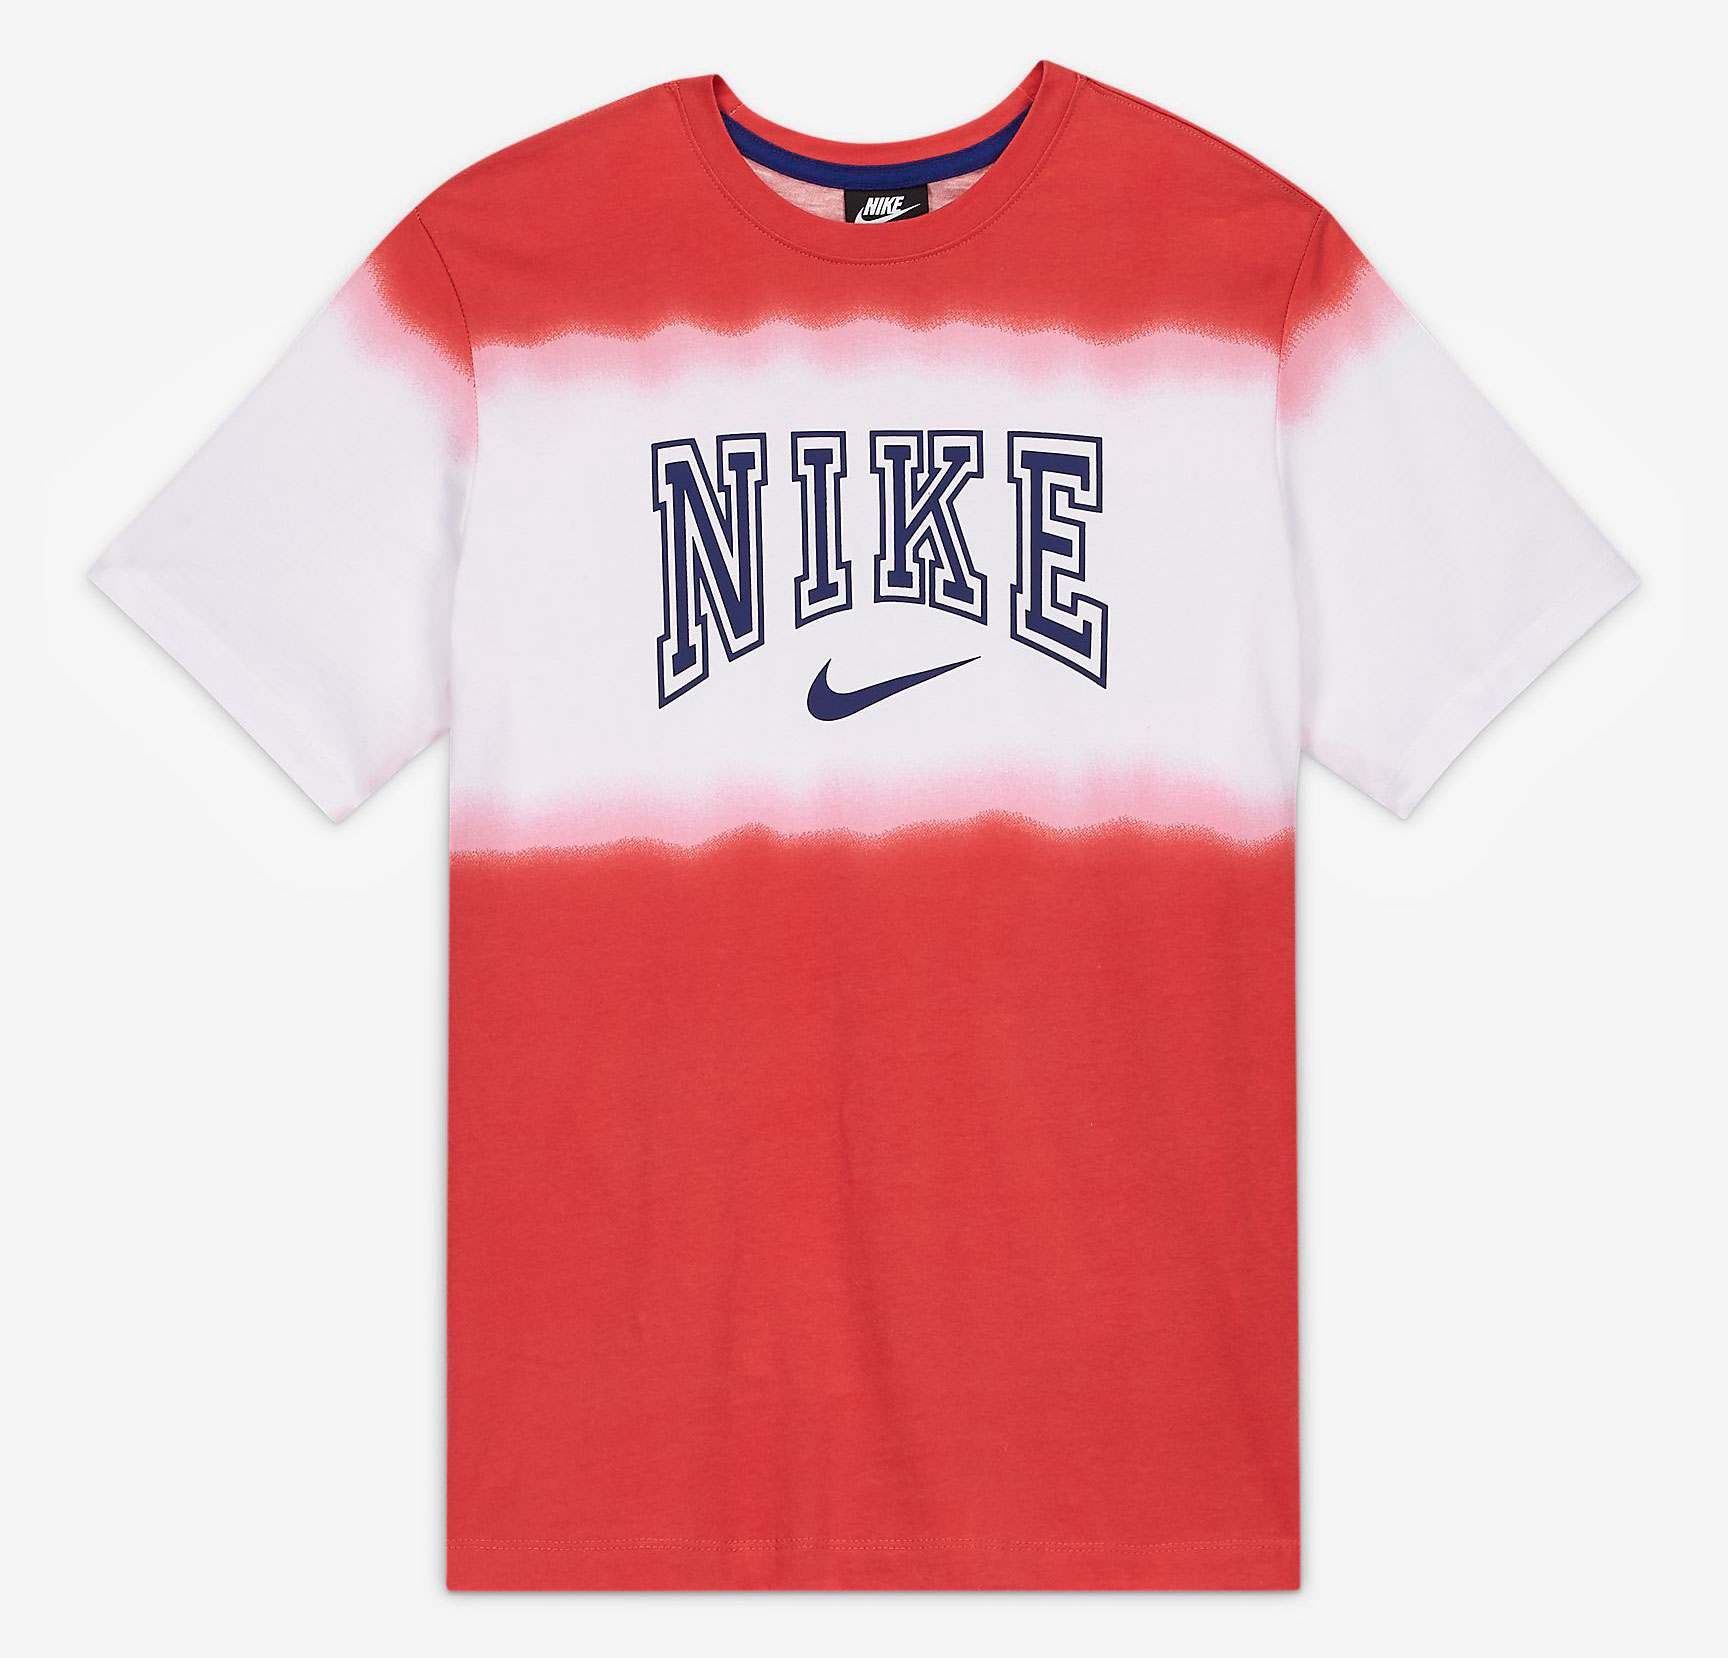 nike-sportswear-usa-americana-tie-dye-shirt